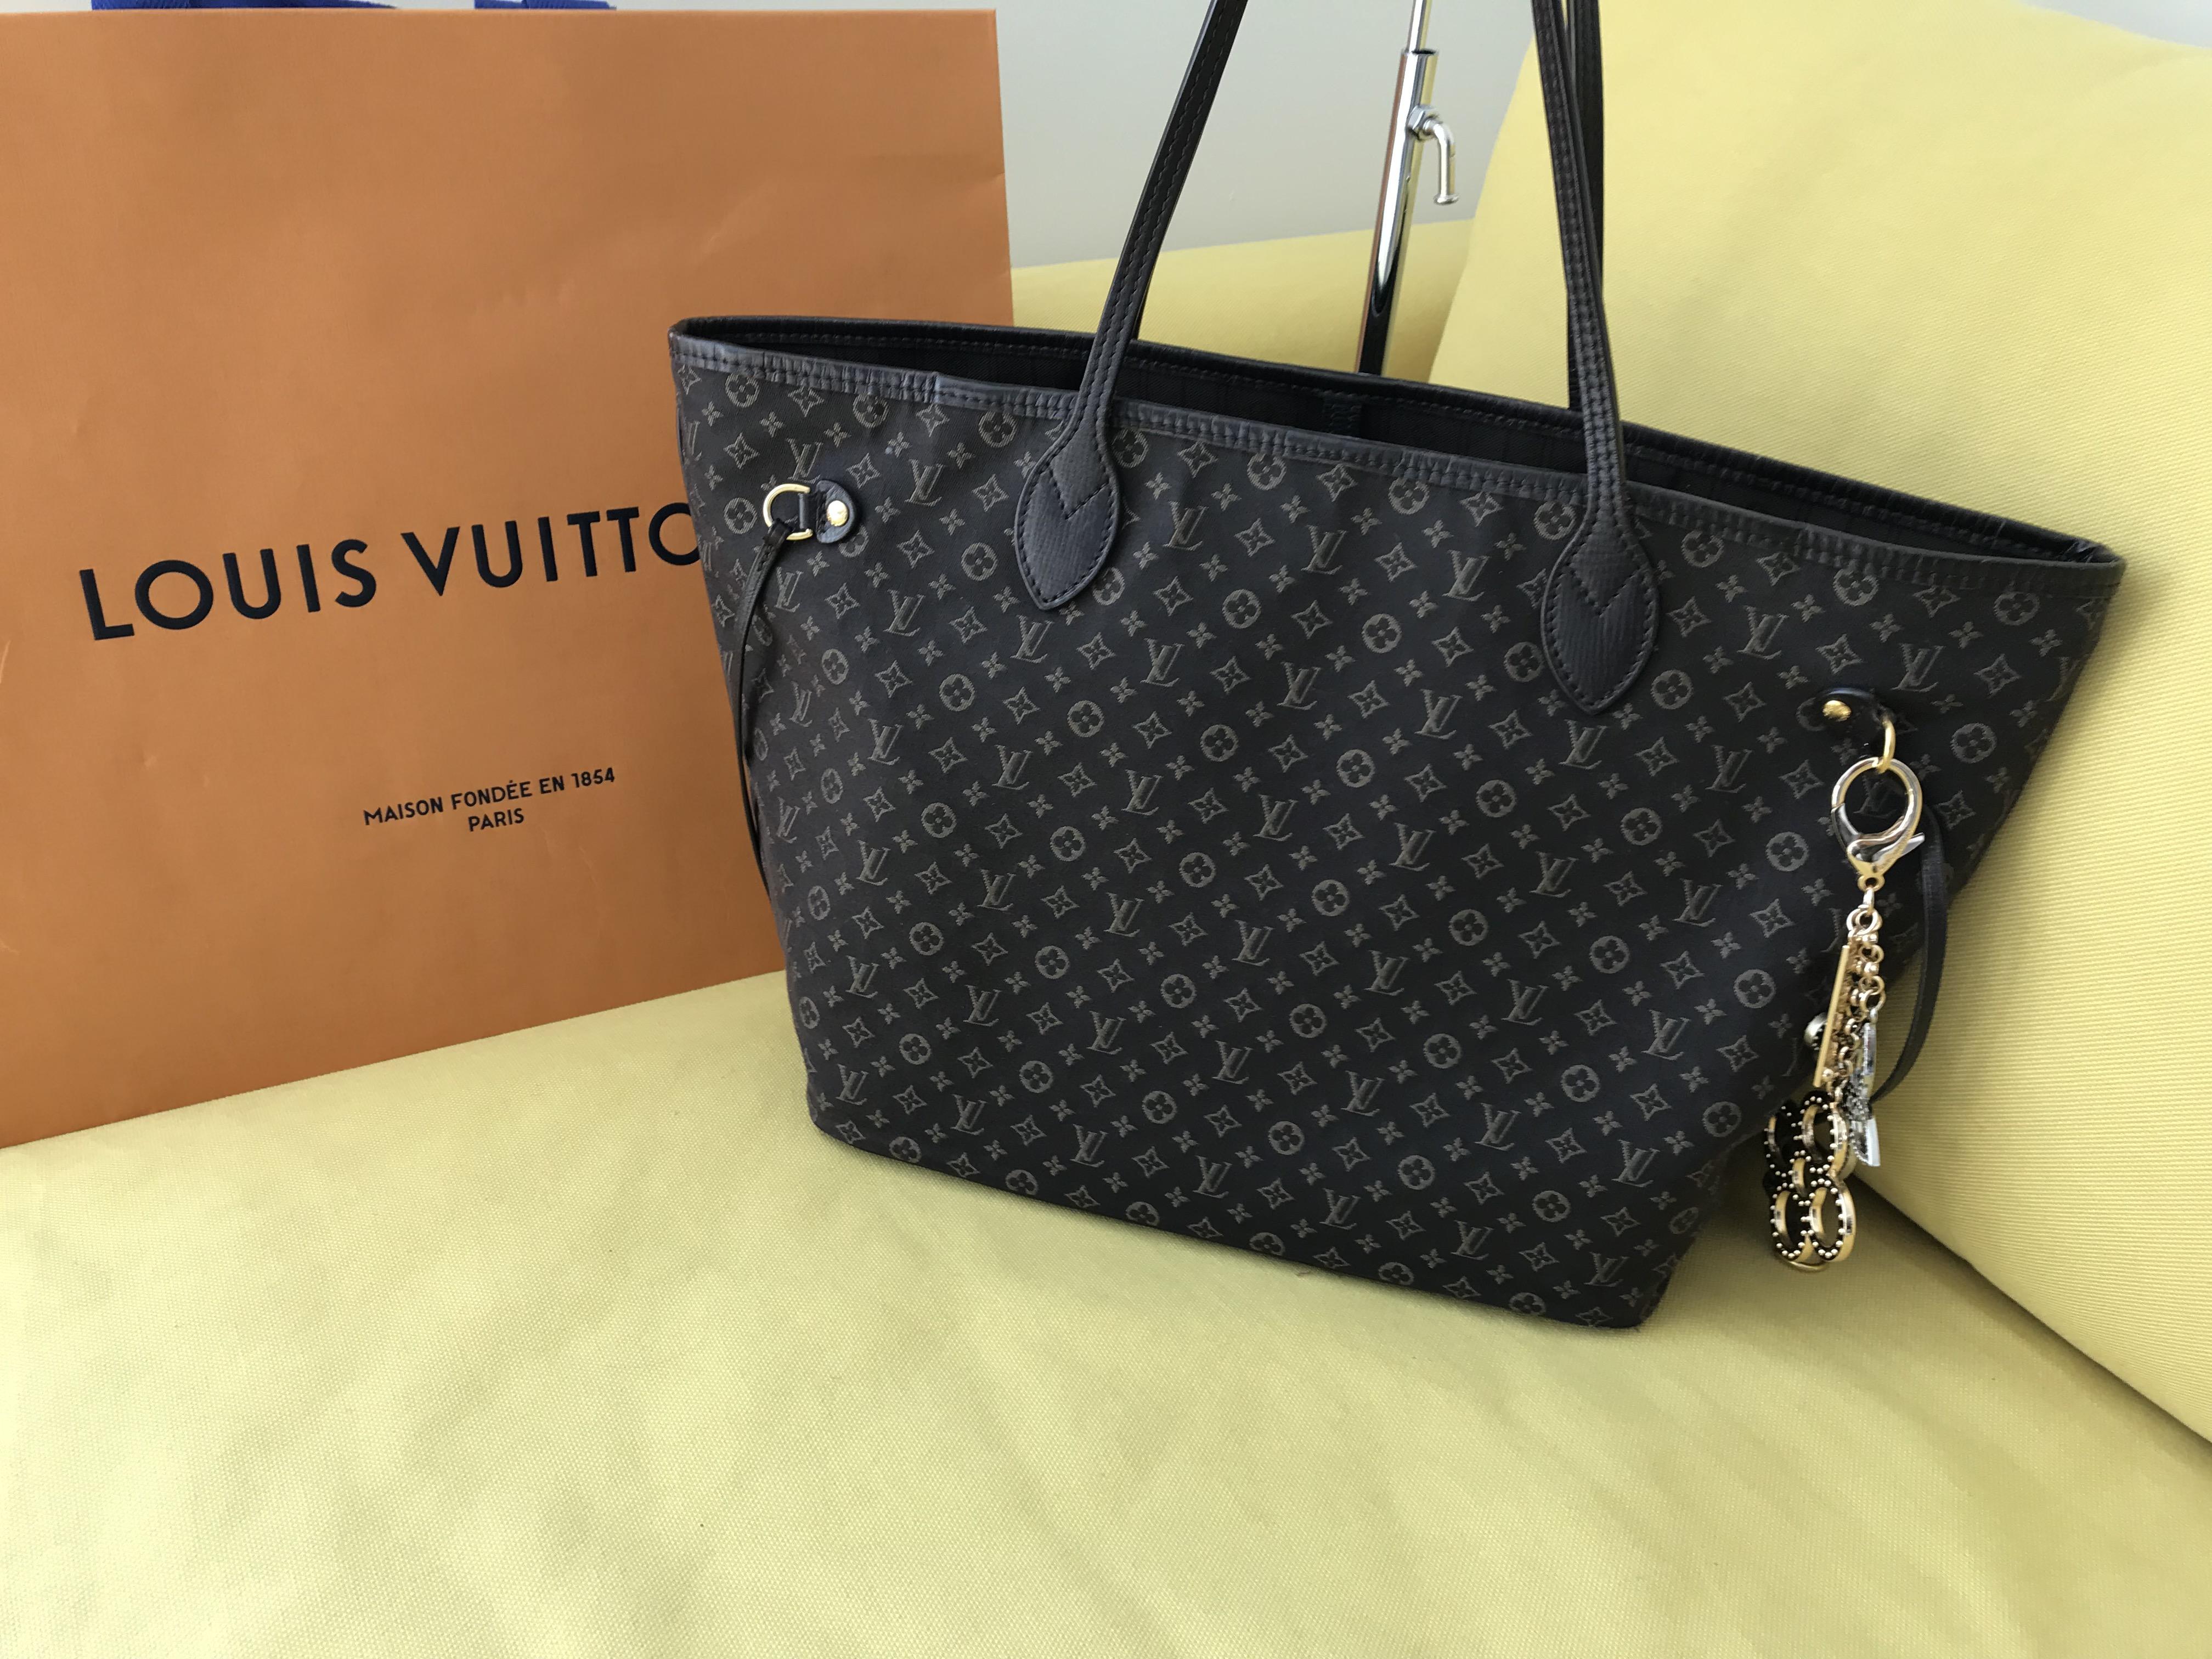 bc497d64b4c0 Home   Bags   Totes   Louis Vuitton Fusain Monogram Idylle Neverfull MM  Tote Bag